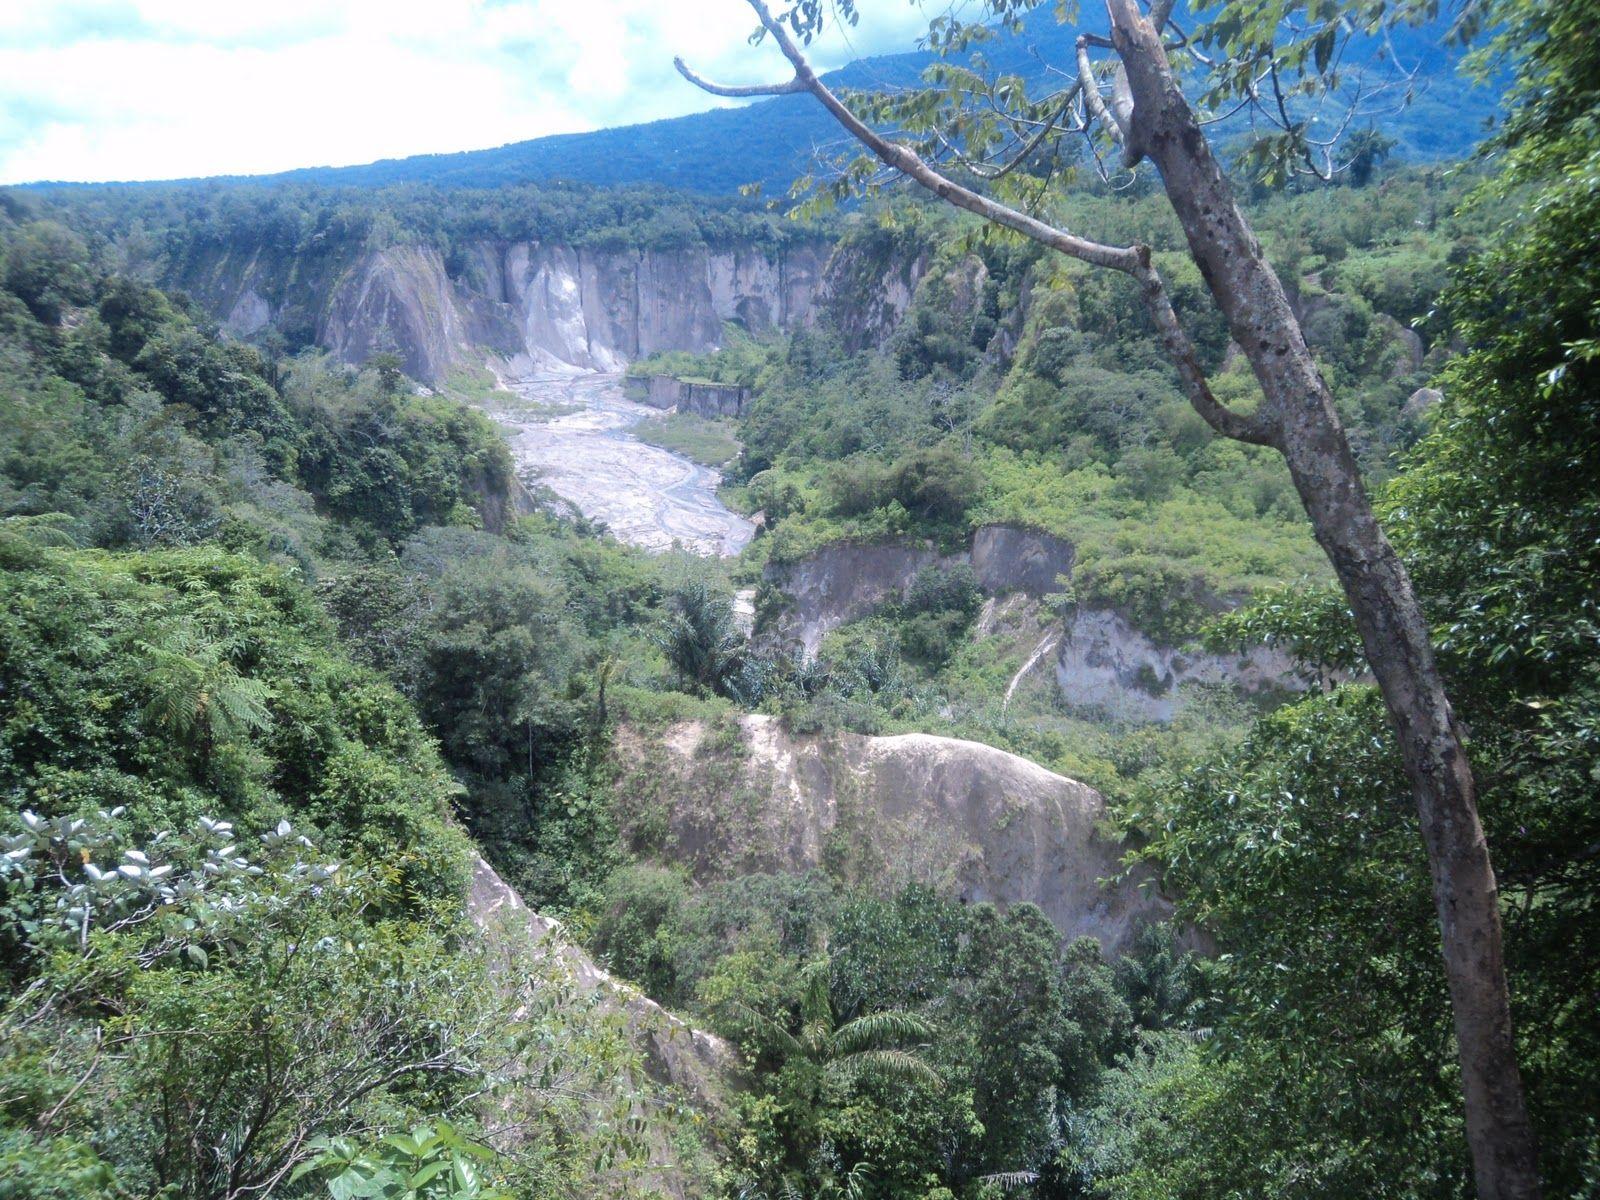 Indonesia. Sumatra. Rainfall in the canyon 75